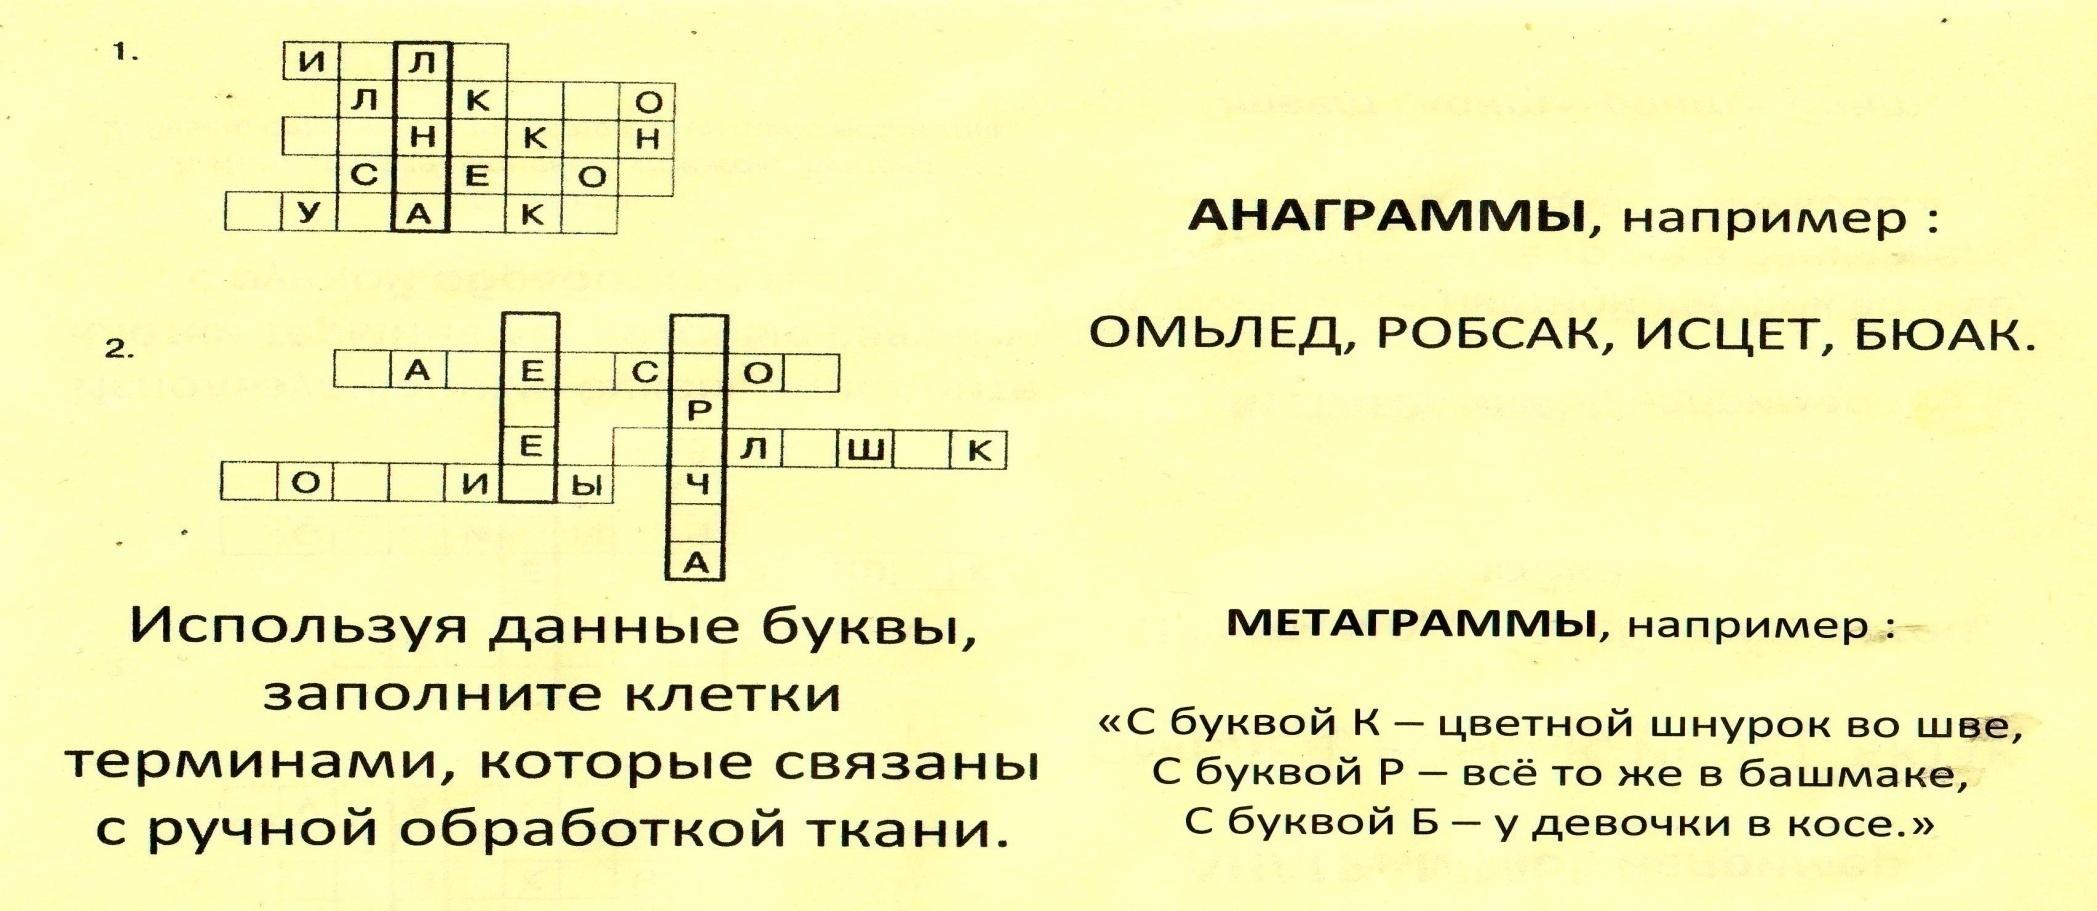 анаграмма кроссворд без ответов0001.JPG